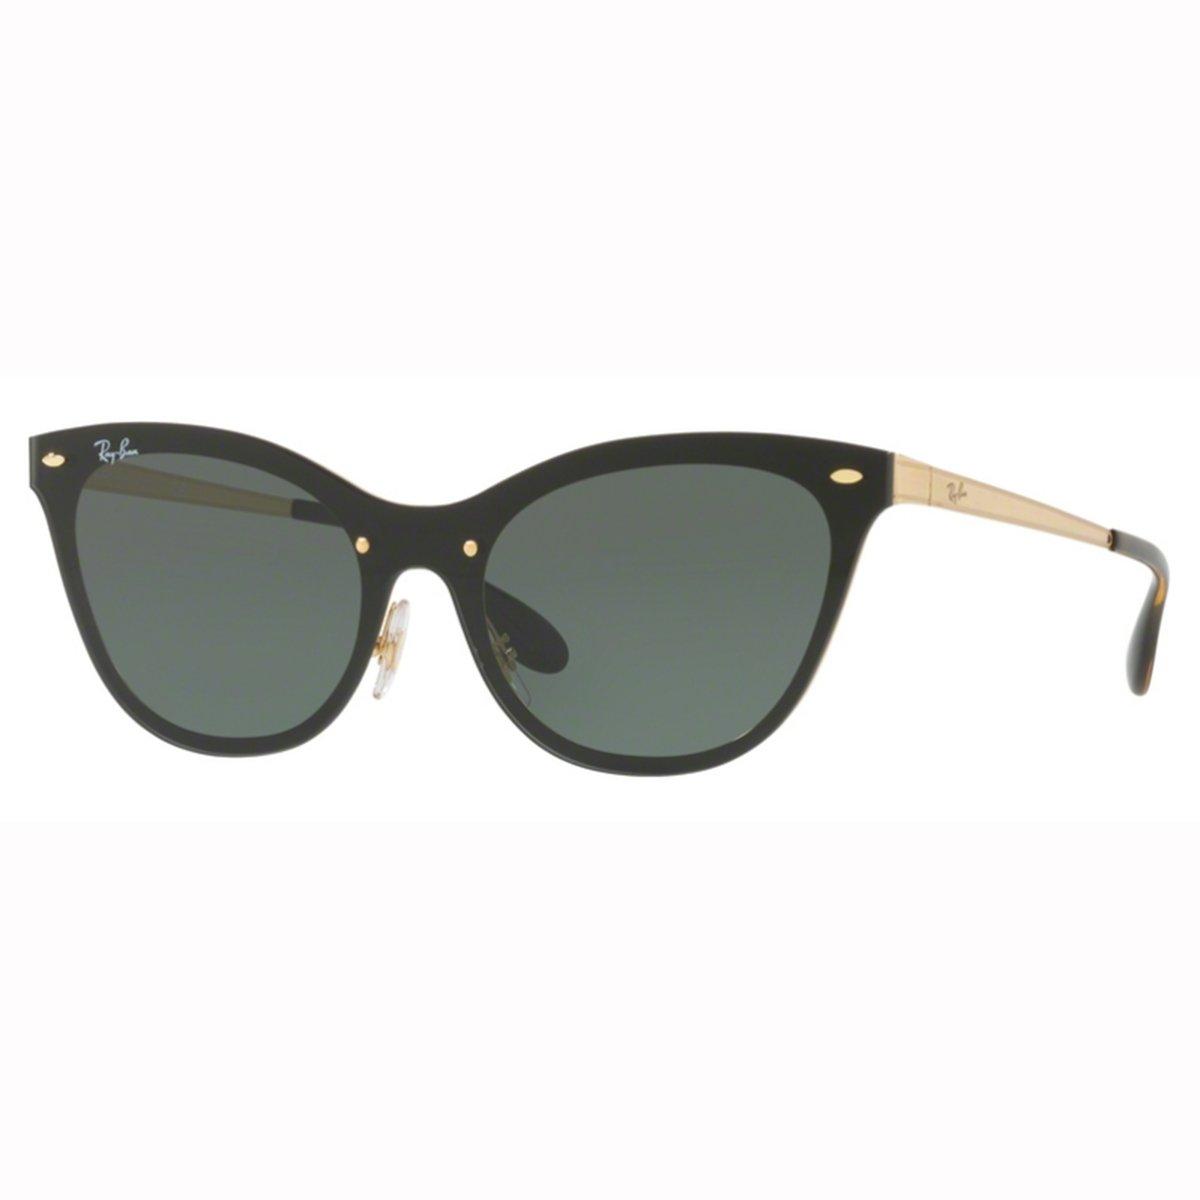 42606841963b1 Compre Óculos de Sol Ray Ban Blaze Cat Eye em 10X